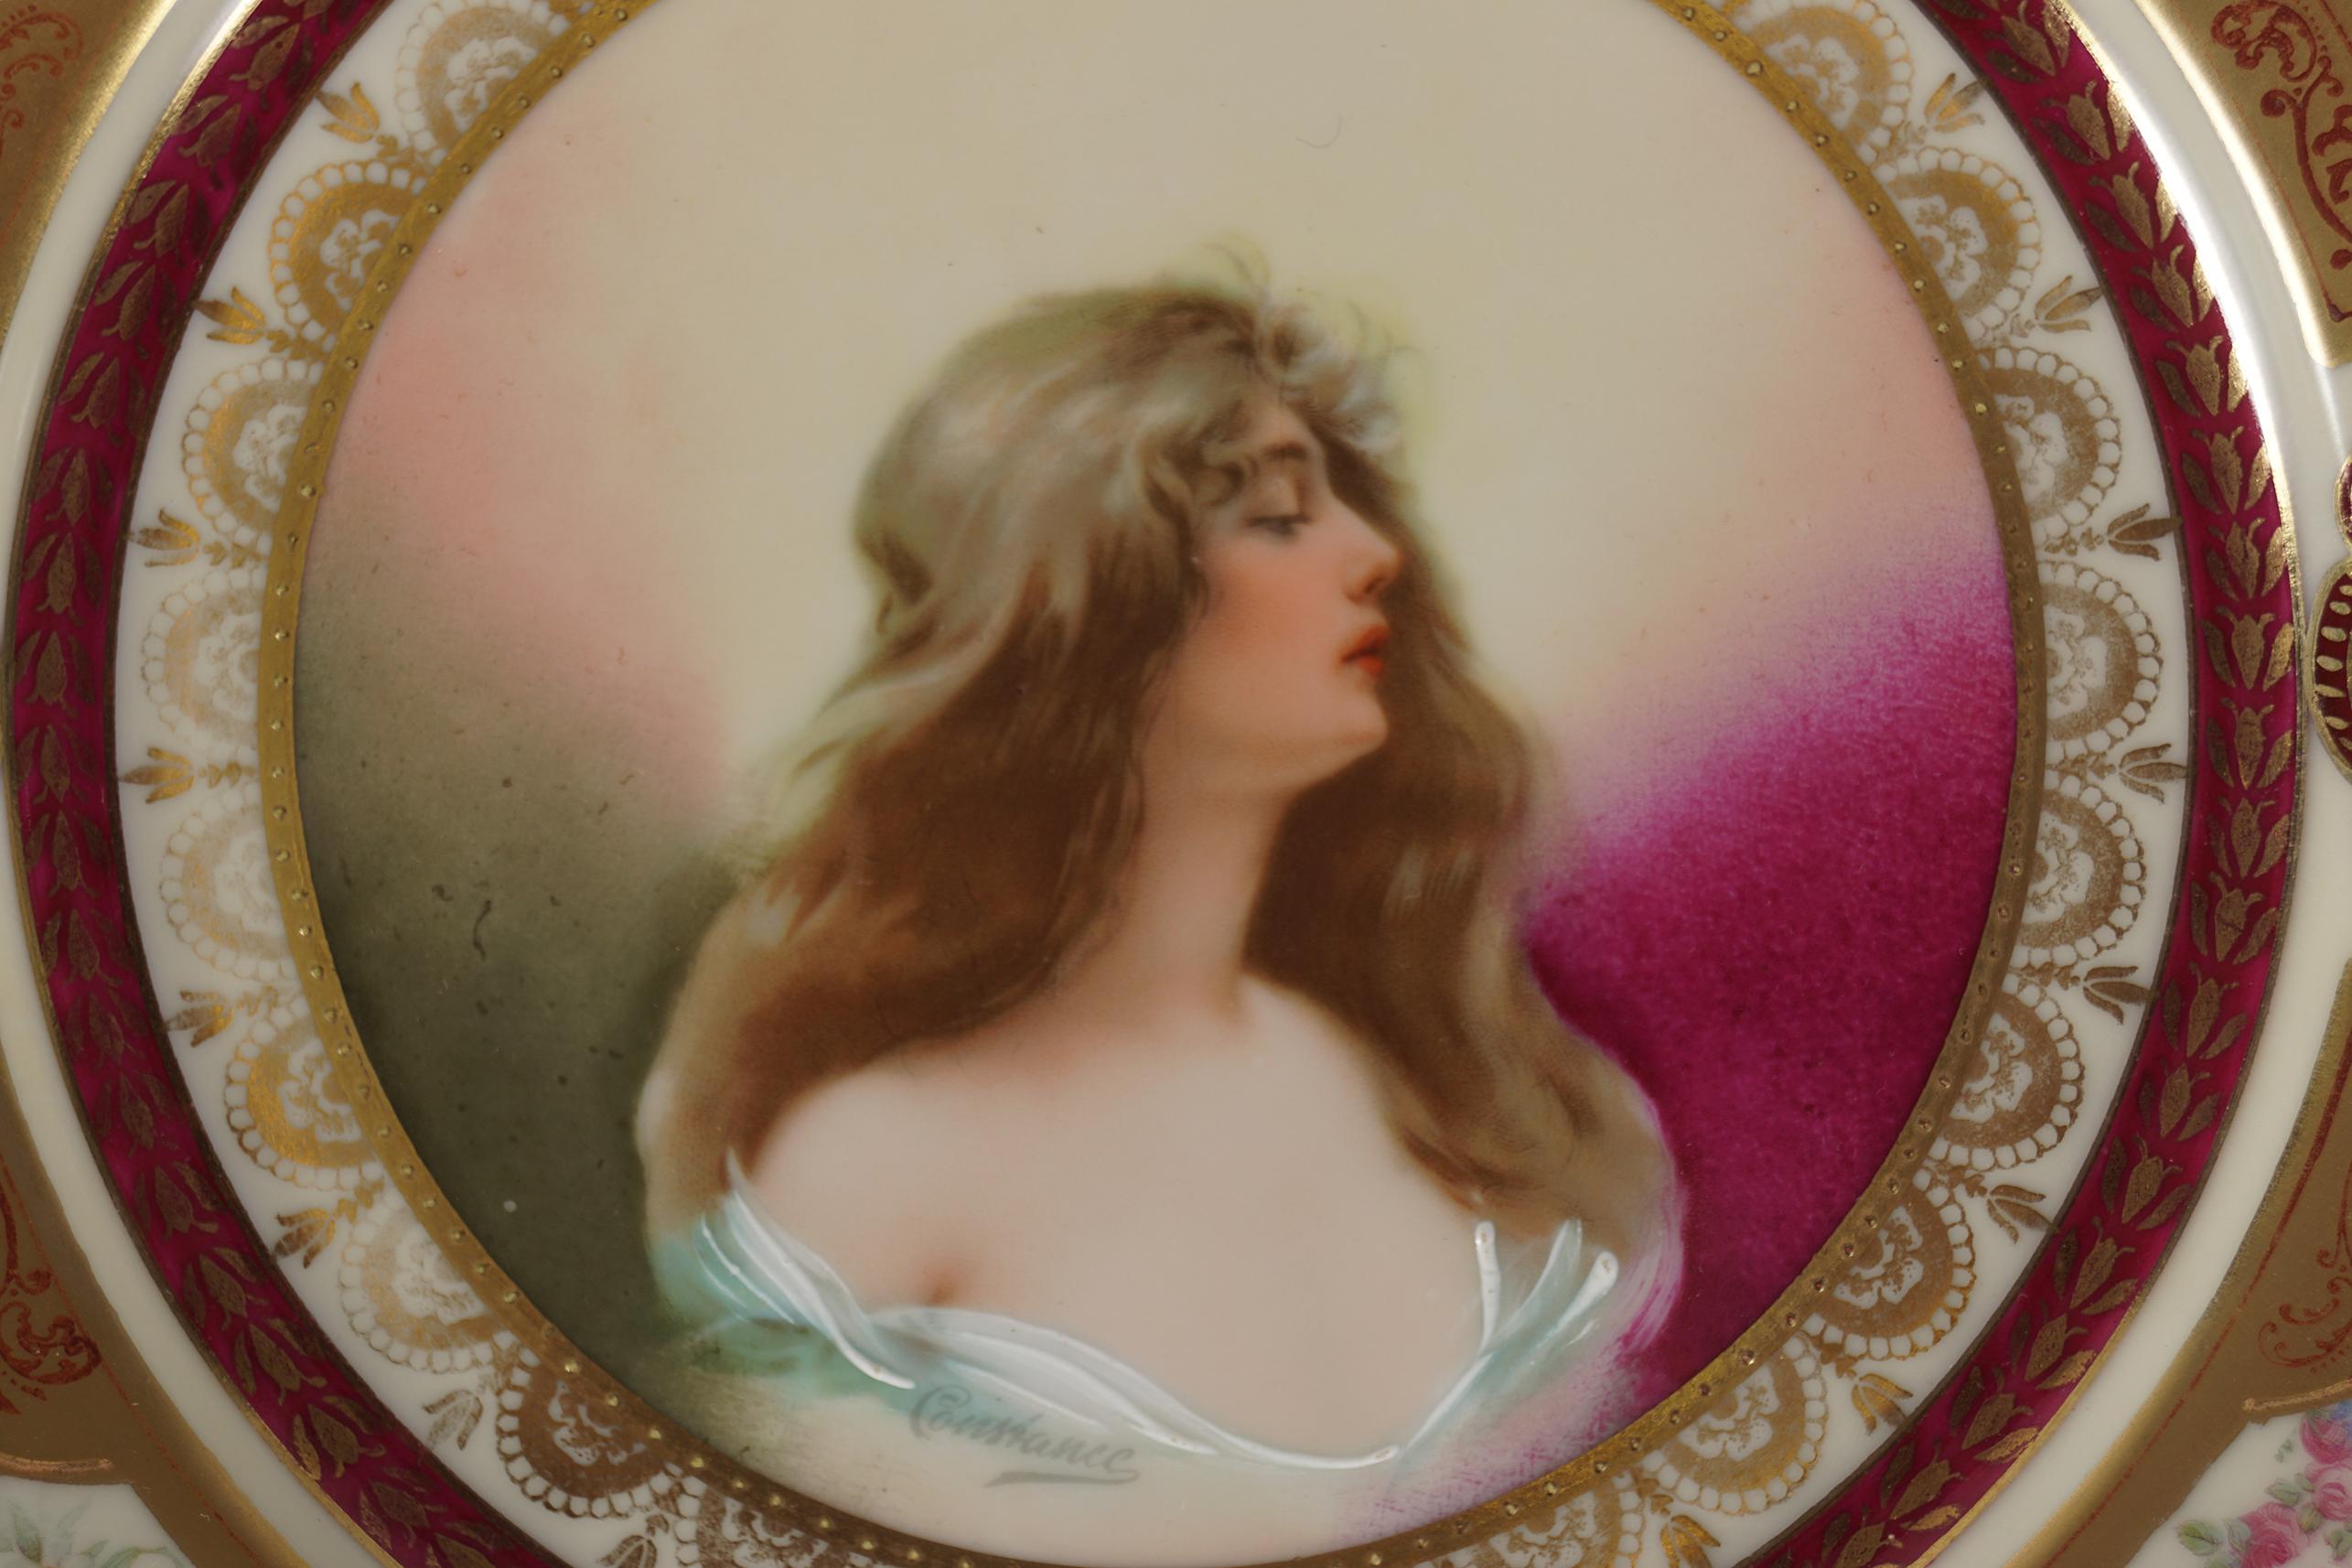 19TH-CENTURY SCHWARZ BURA PORCELAIN CABINET PLATE - Image 2 of 4